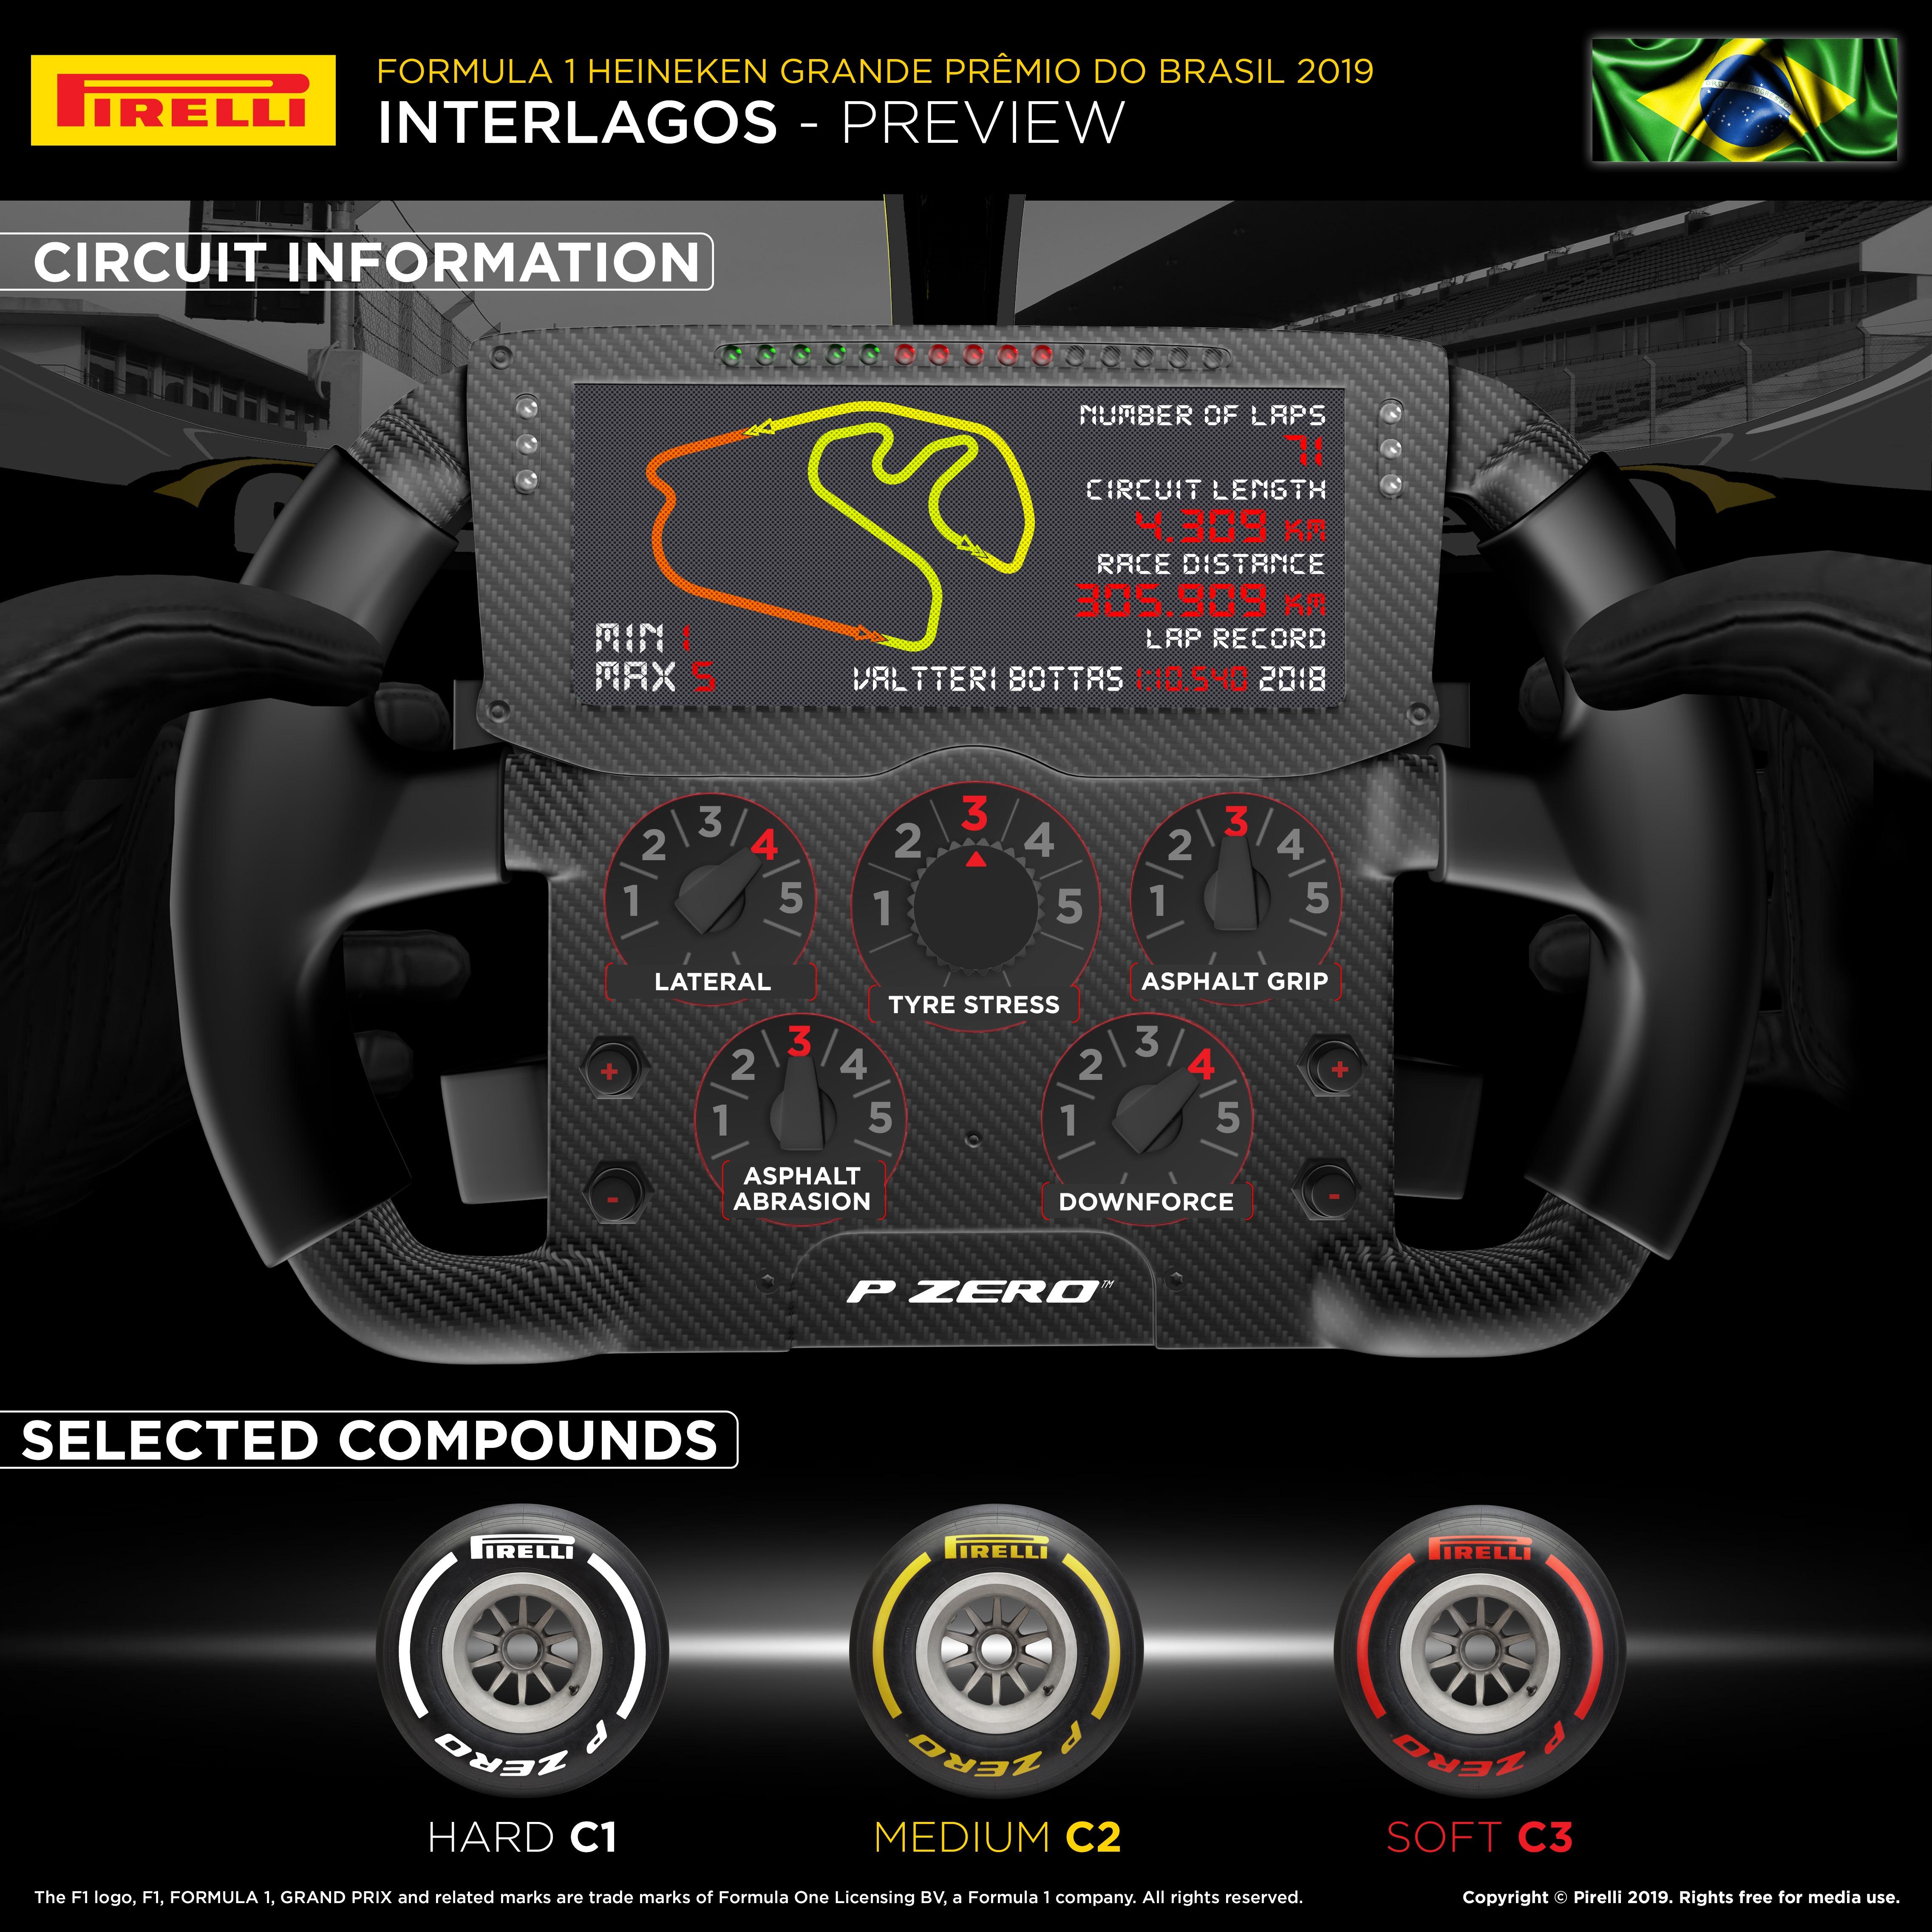 2019 Brazilian Formula 1 grand prix infographic